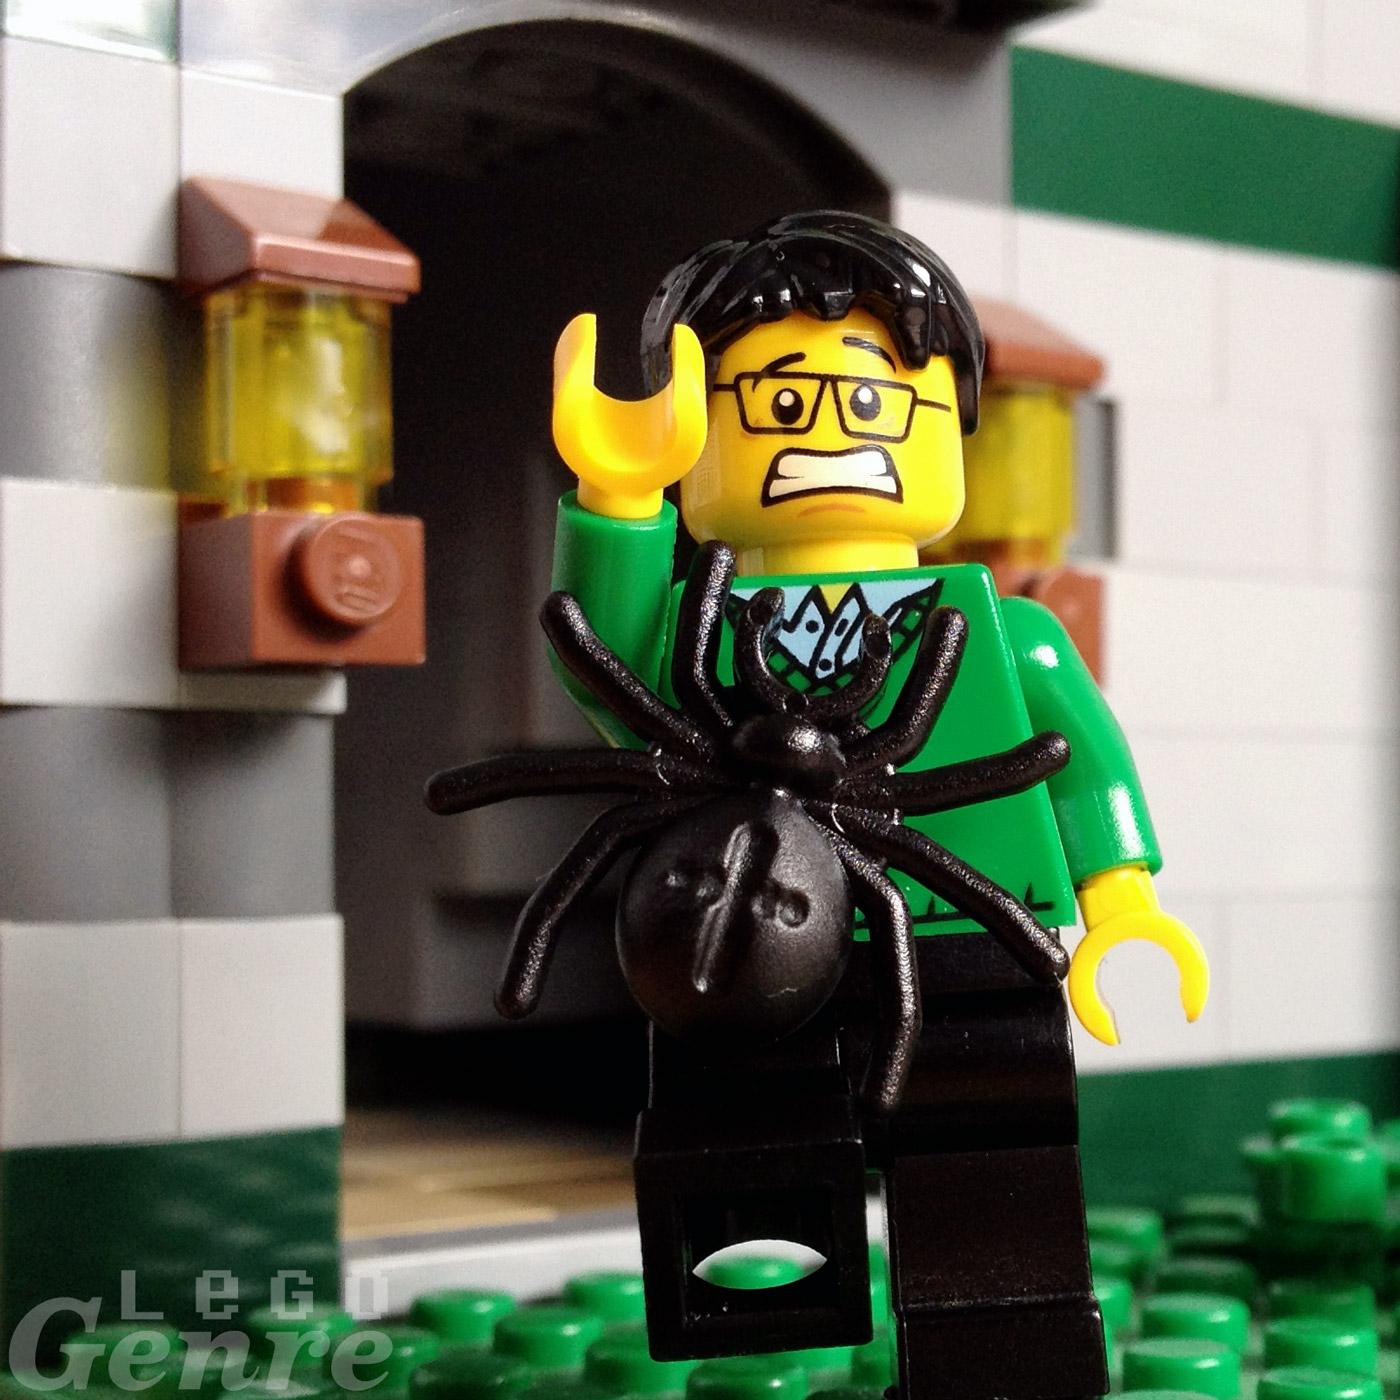 LegoGenre 00360: Get if off of me. GET IT OFF!